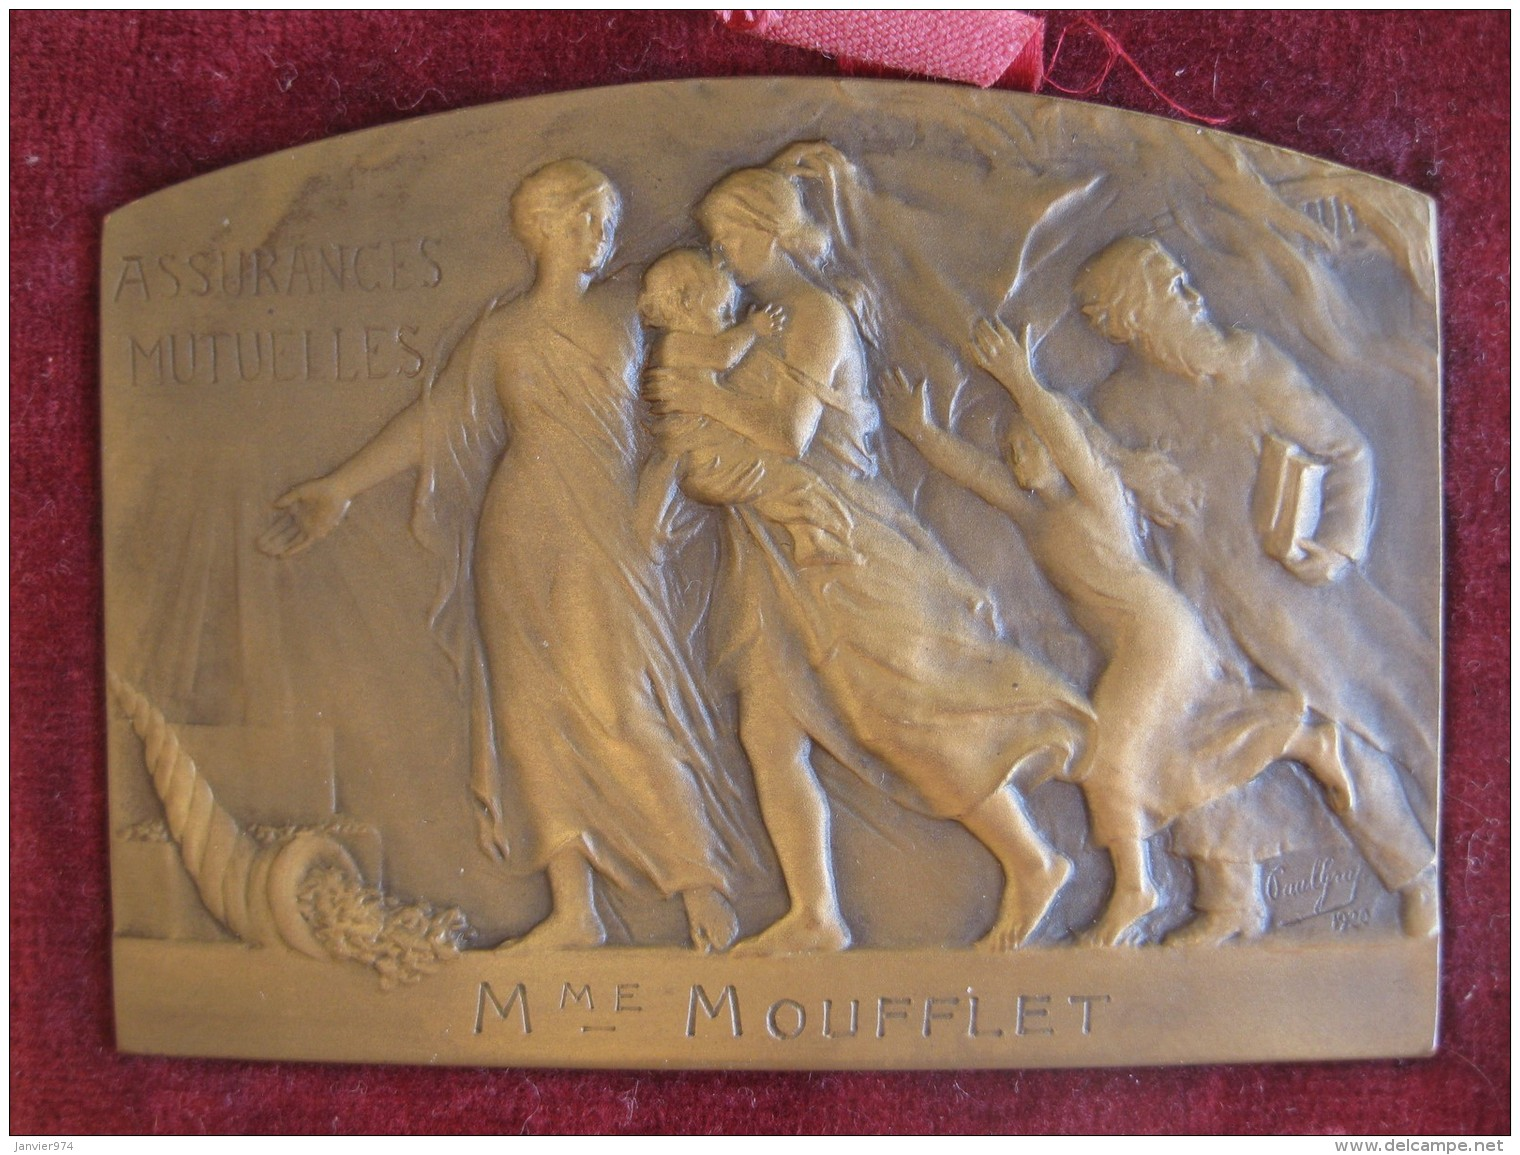 Médaille Centenaire Assurances Mutuelles 1919, Offert à Moufflet, Par Paul Graf - France